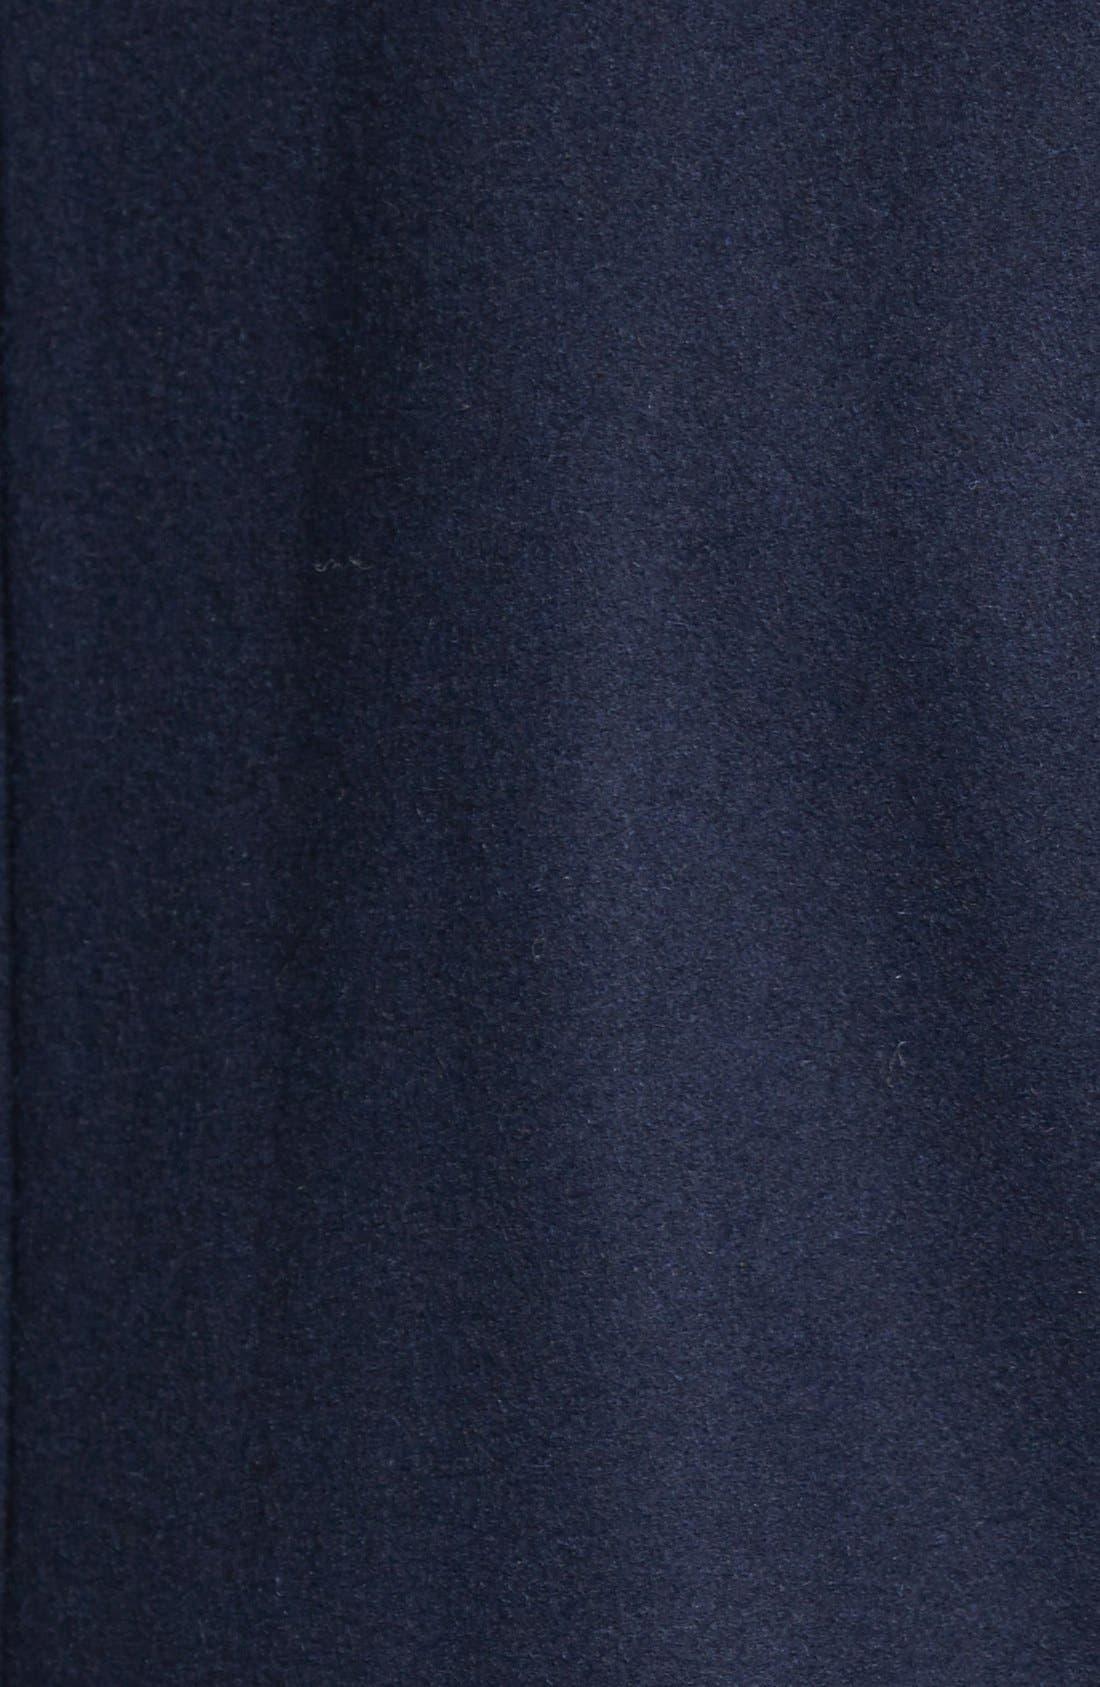 Alternate Image 3  - Sam Edelman 'Leah' Faux Fur & Plaid Trim Asymmetrical Coat